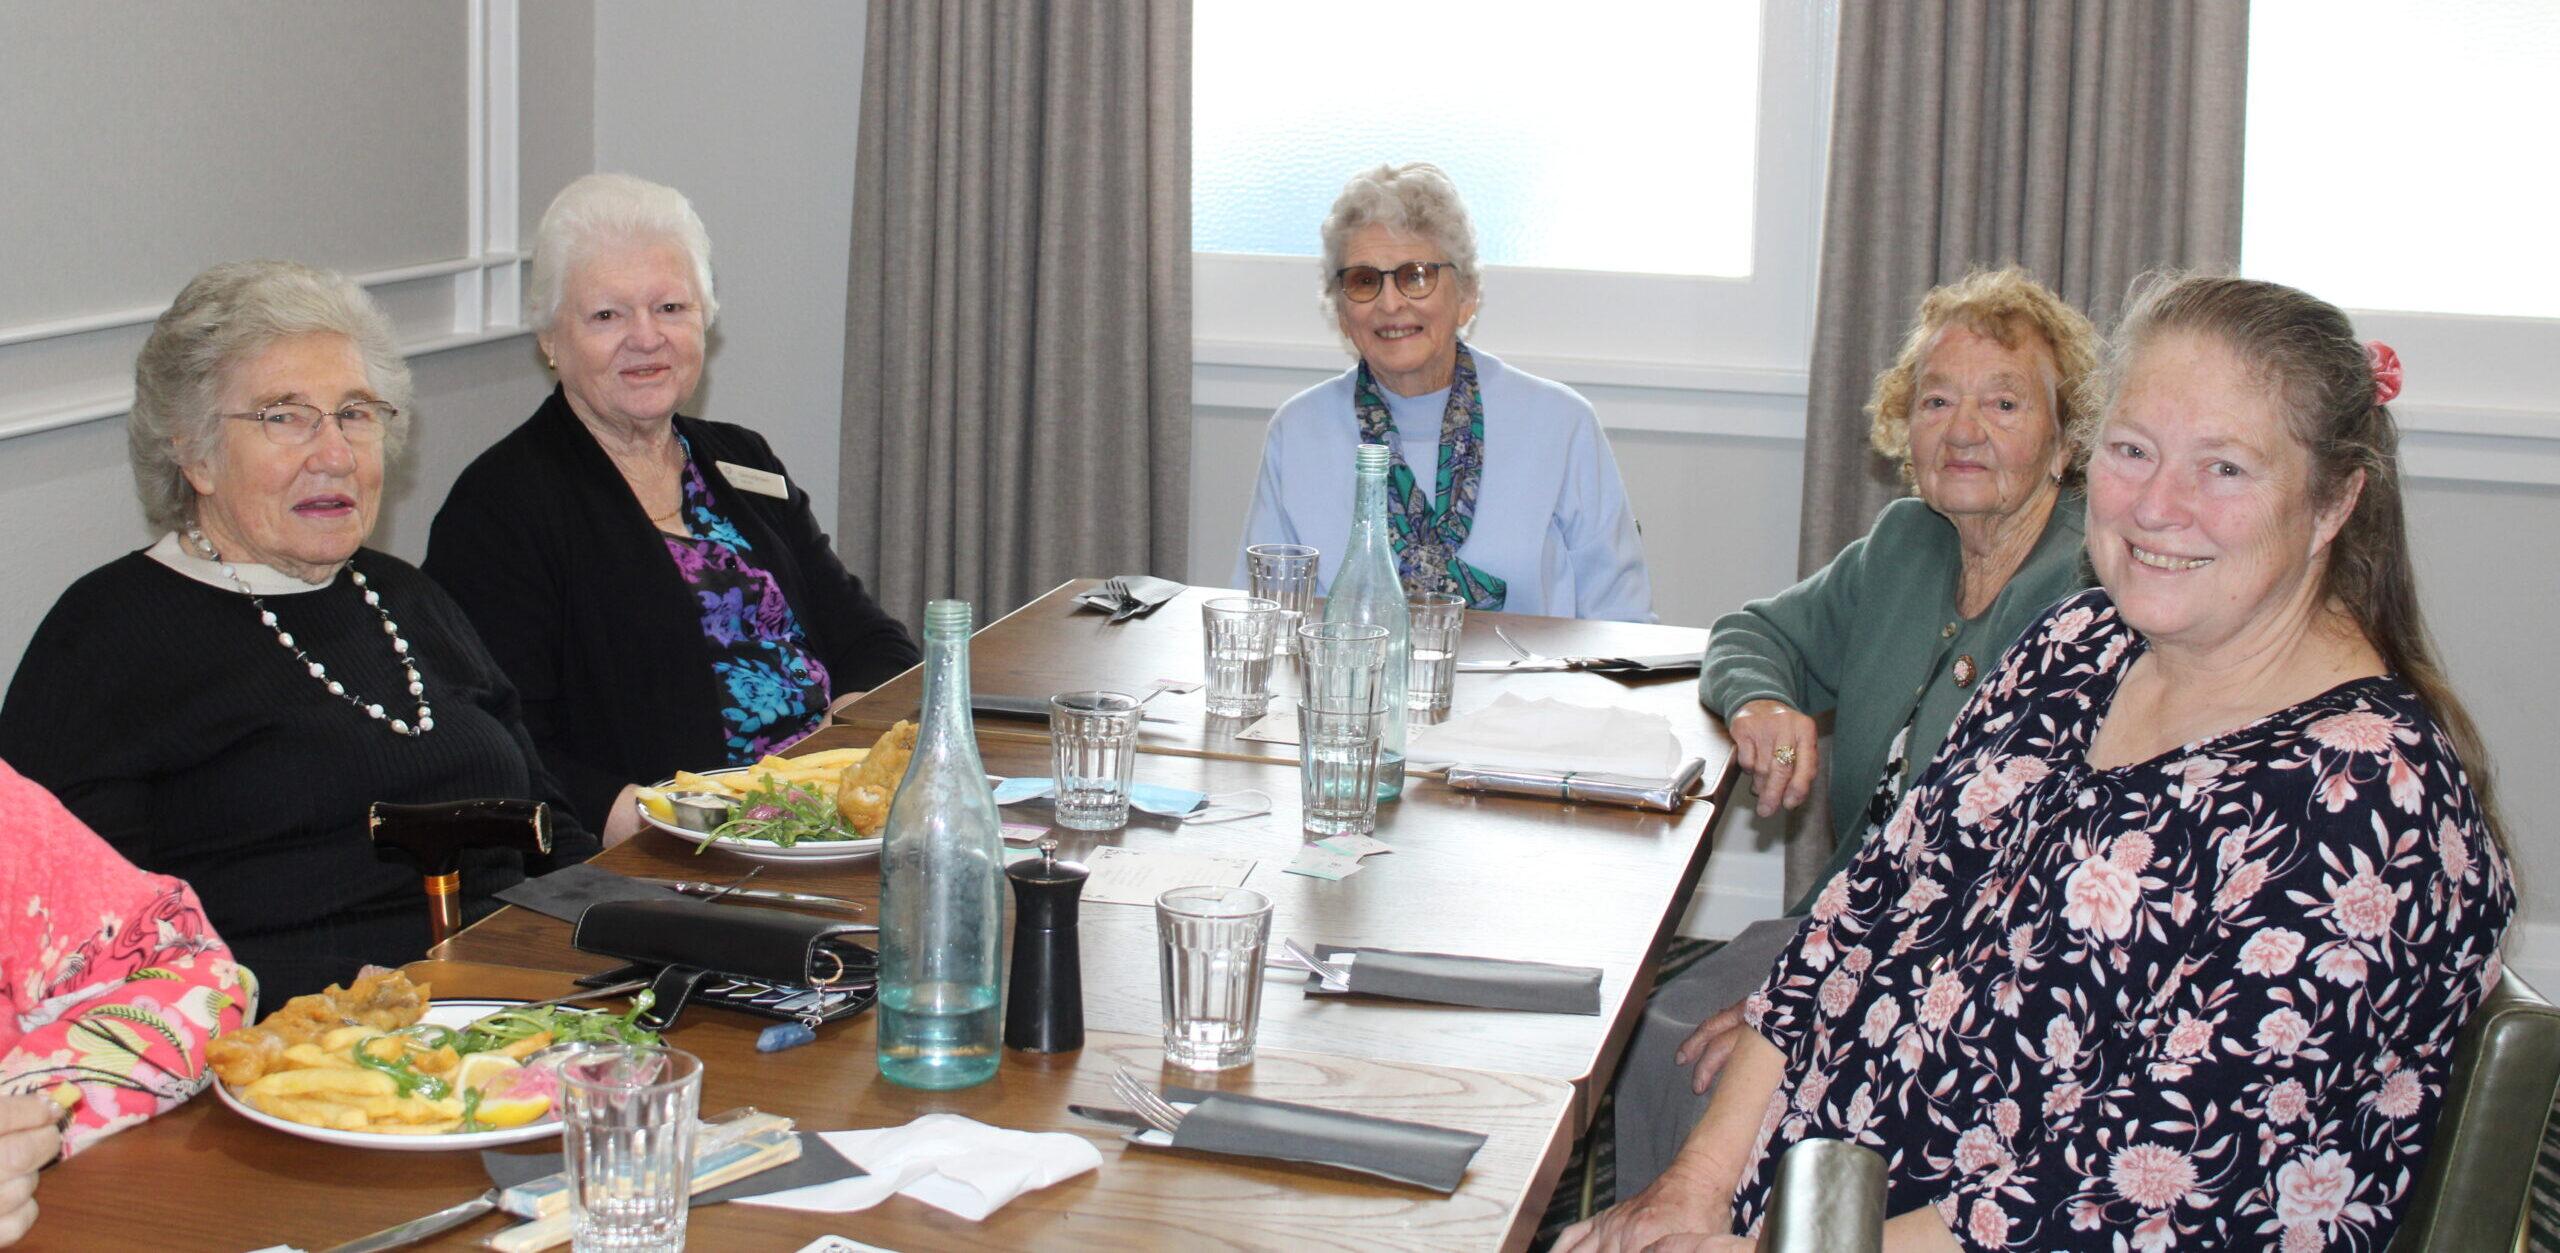 Sue Hunt, Gloria Brown, Gwenda Fordham, Pat Hlad and Kristine Allen.